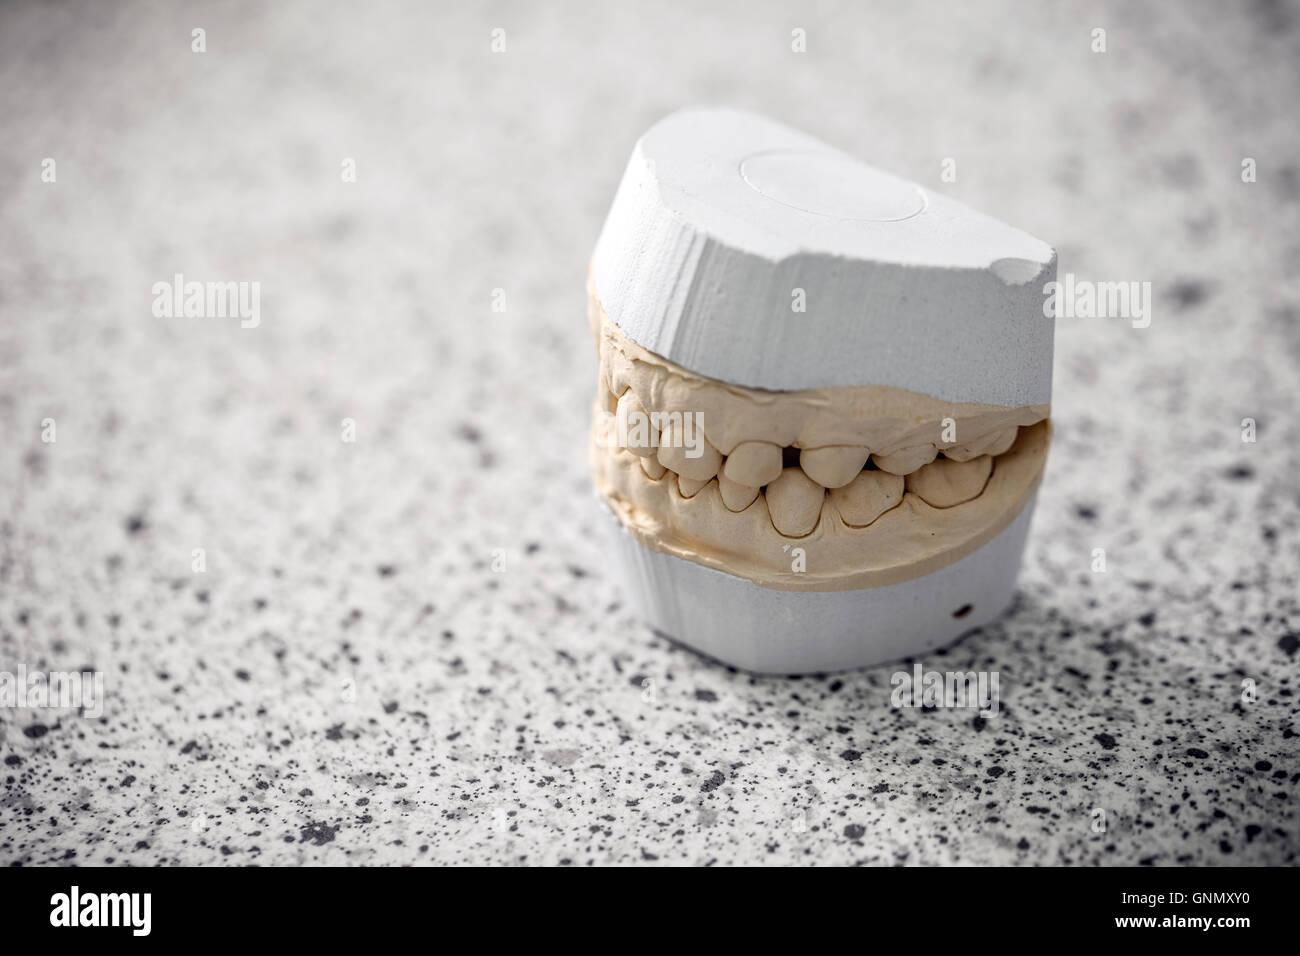 Gypsum model plaster of tooth - Stock Image